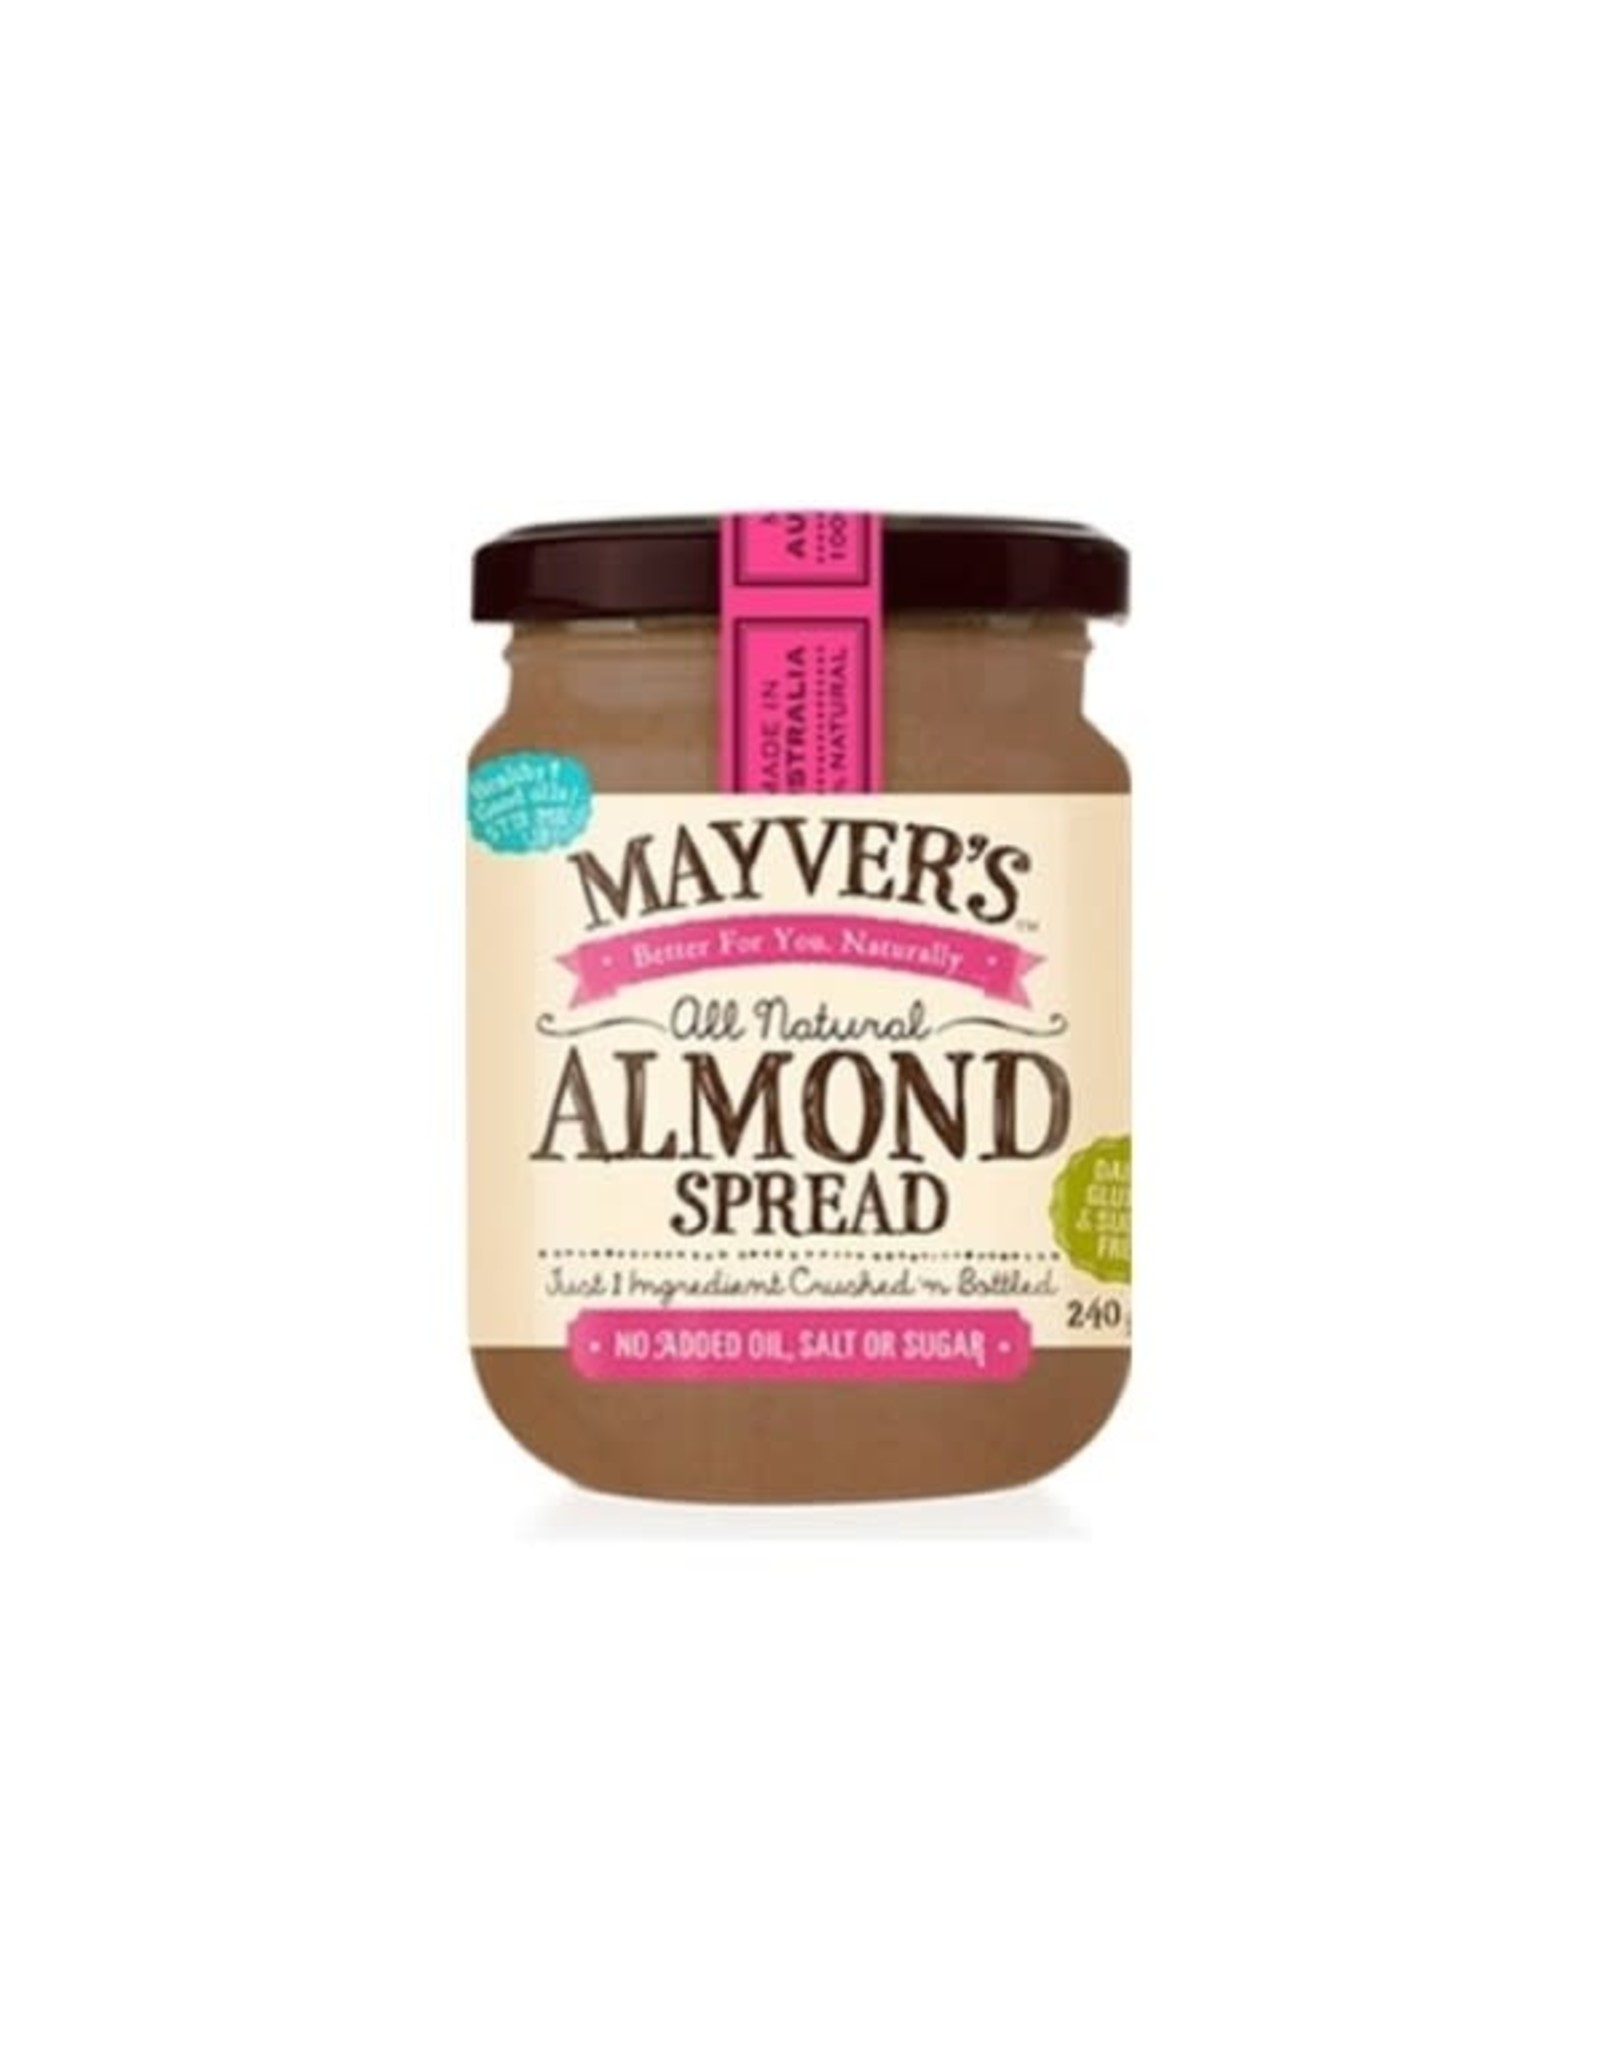 Mayvers Almond Spread